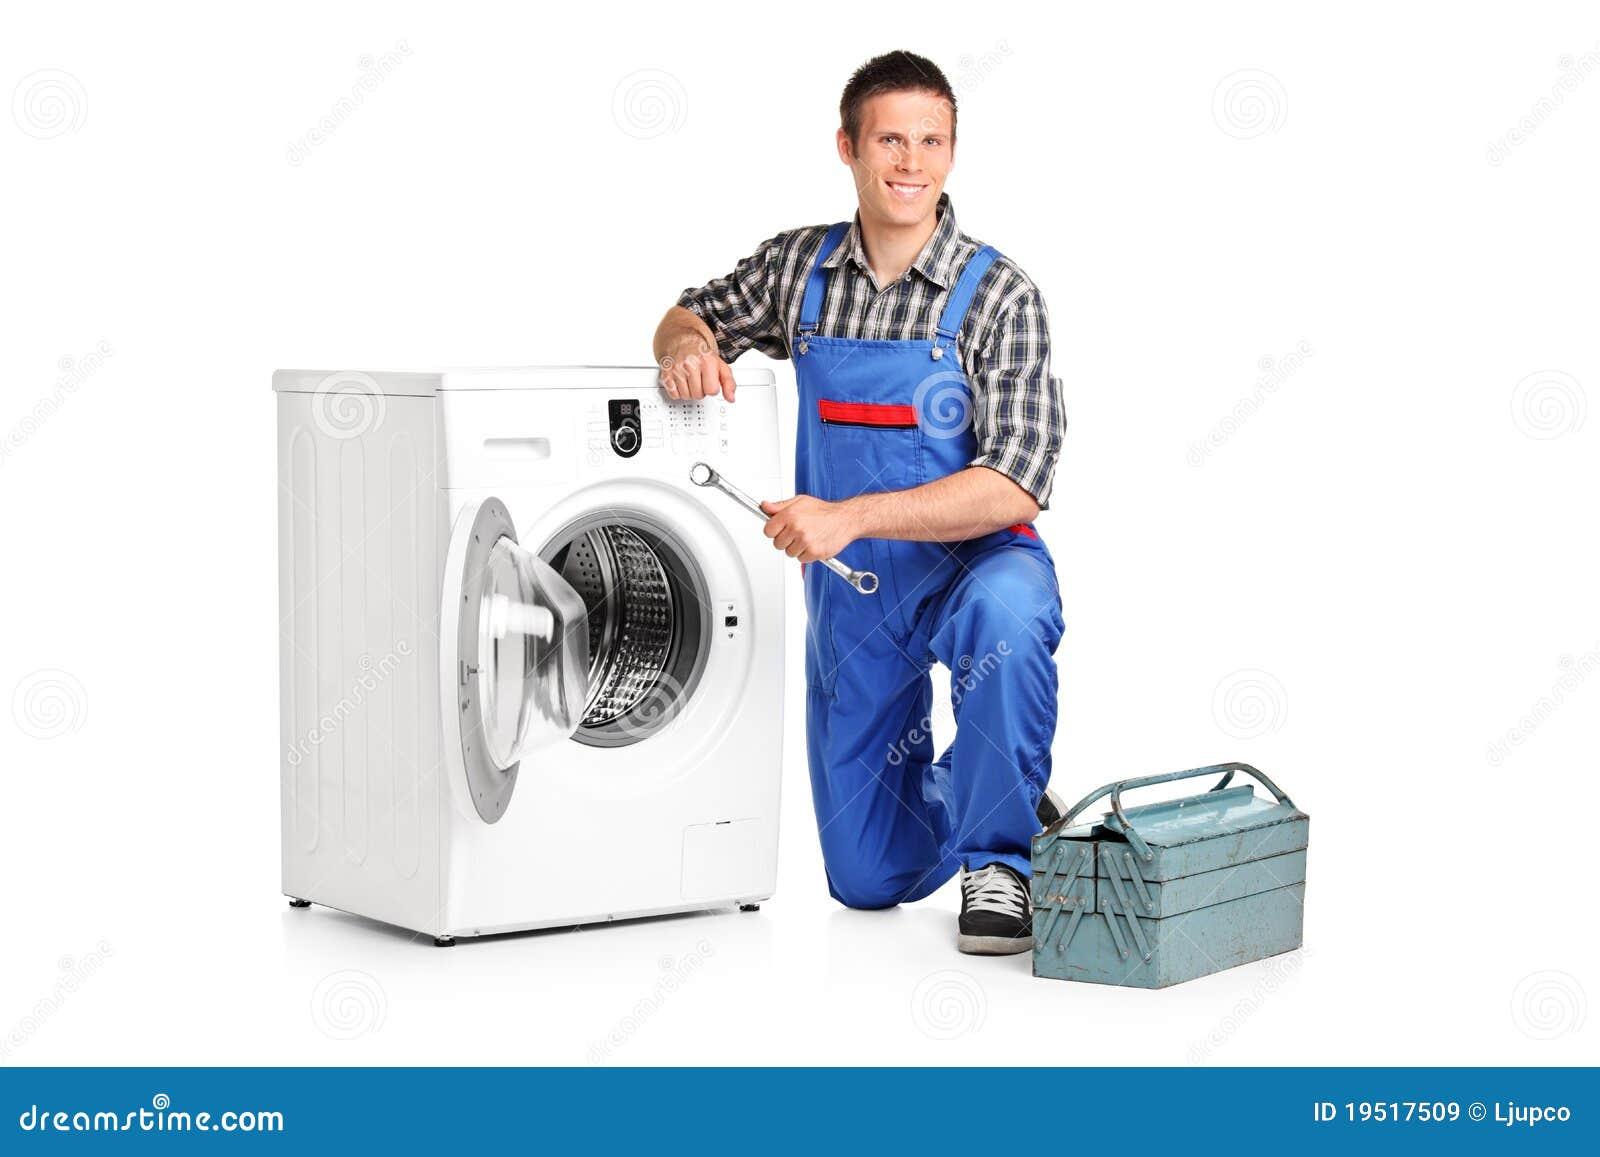 Repairman posing next to a washing machine